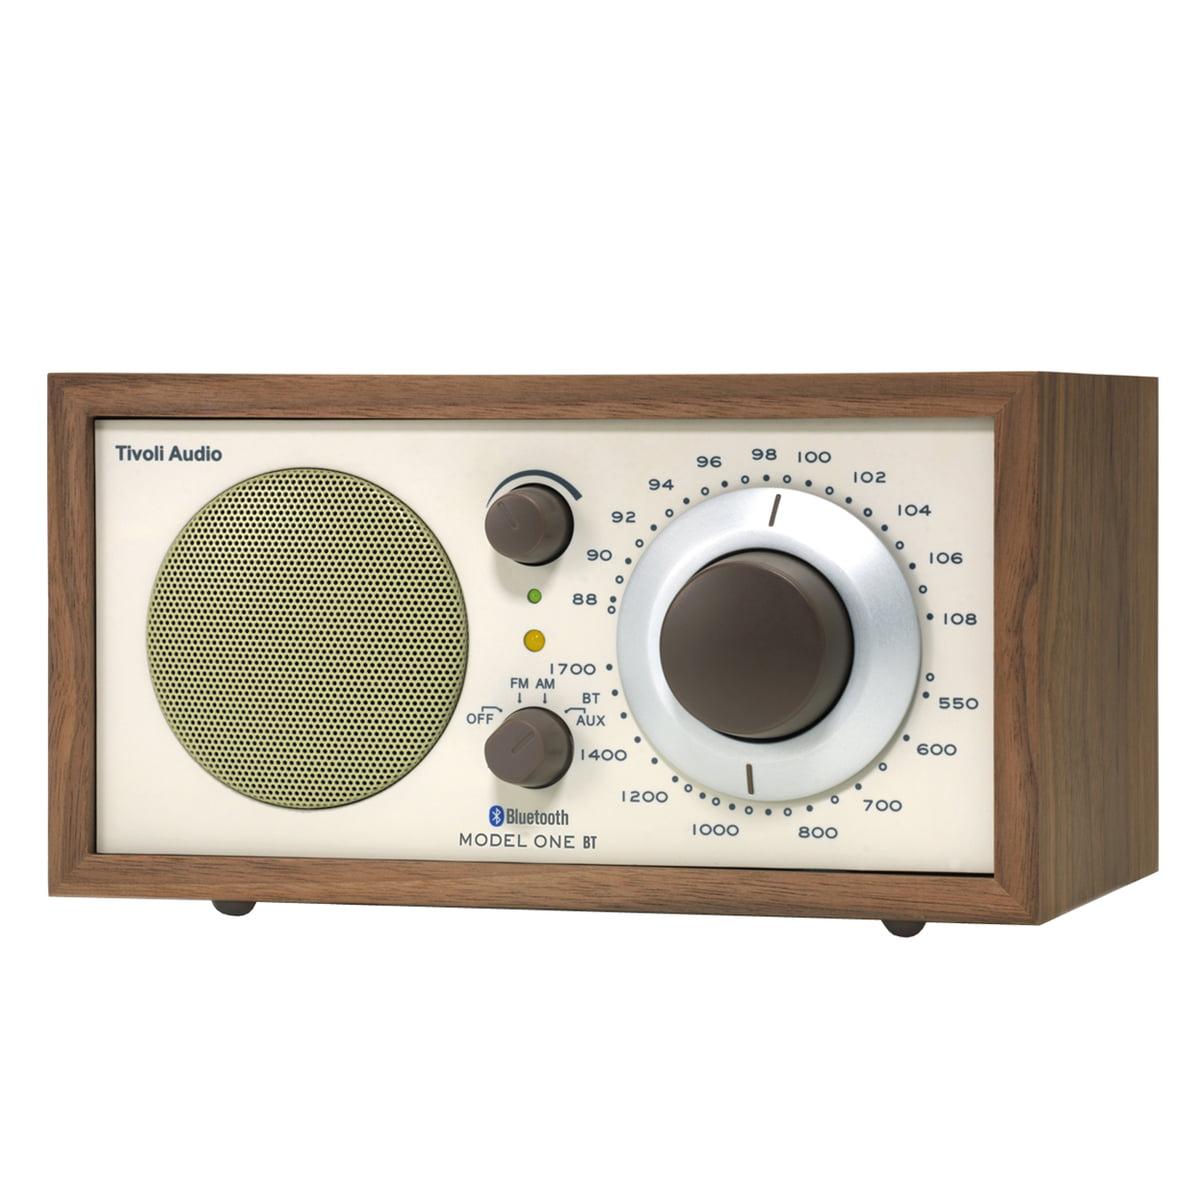 the tivoli audio model one bt in the interior design shop. Black Bedroom Furniture Sets. Home Design Ideas